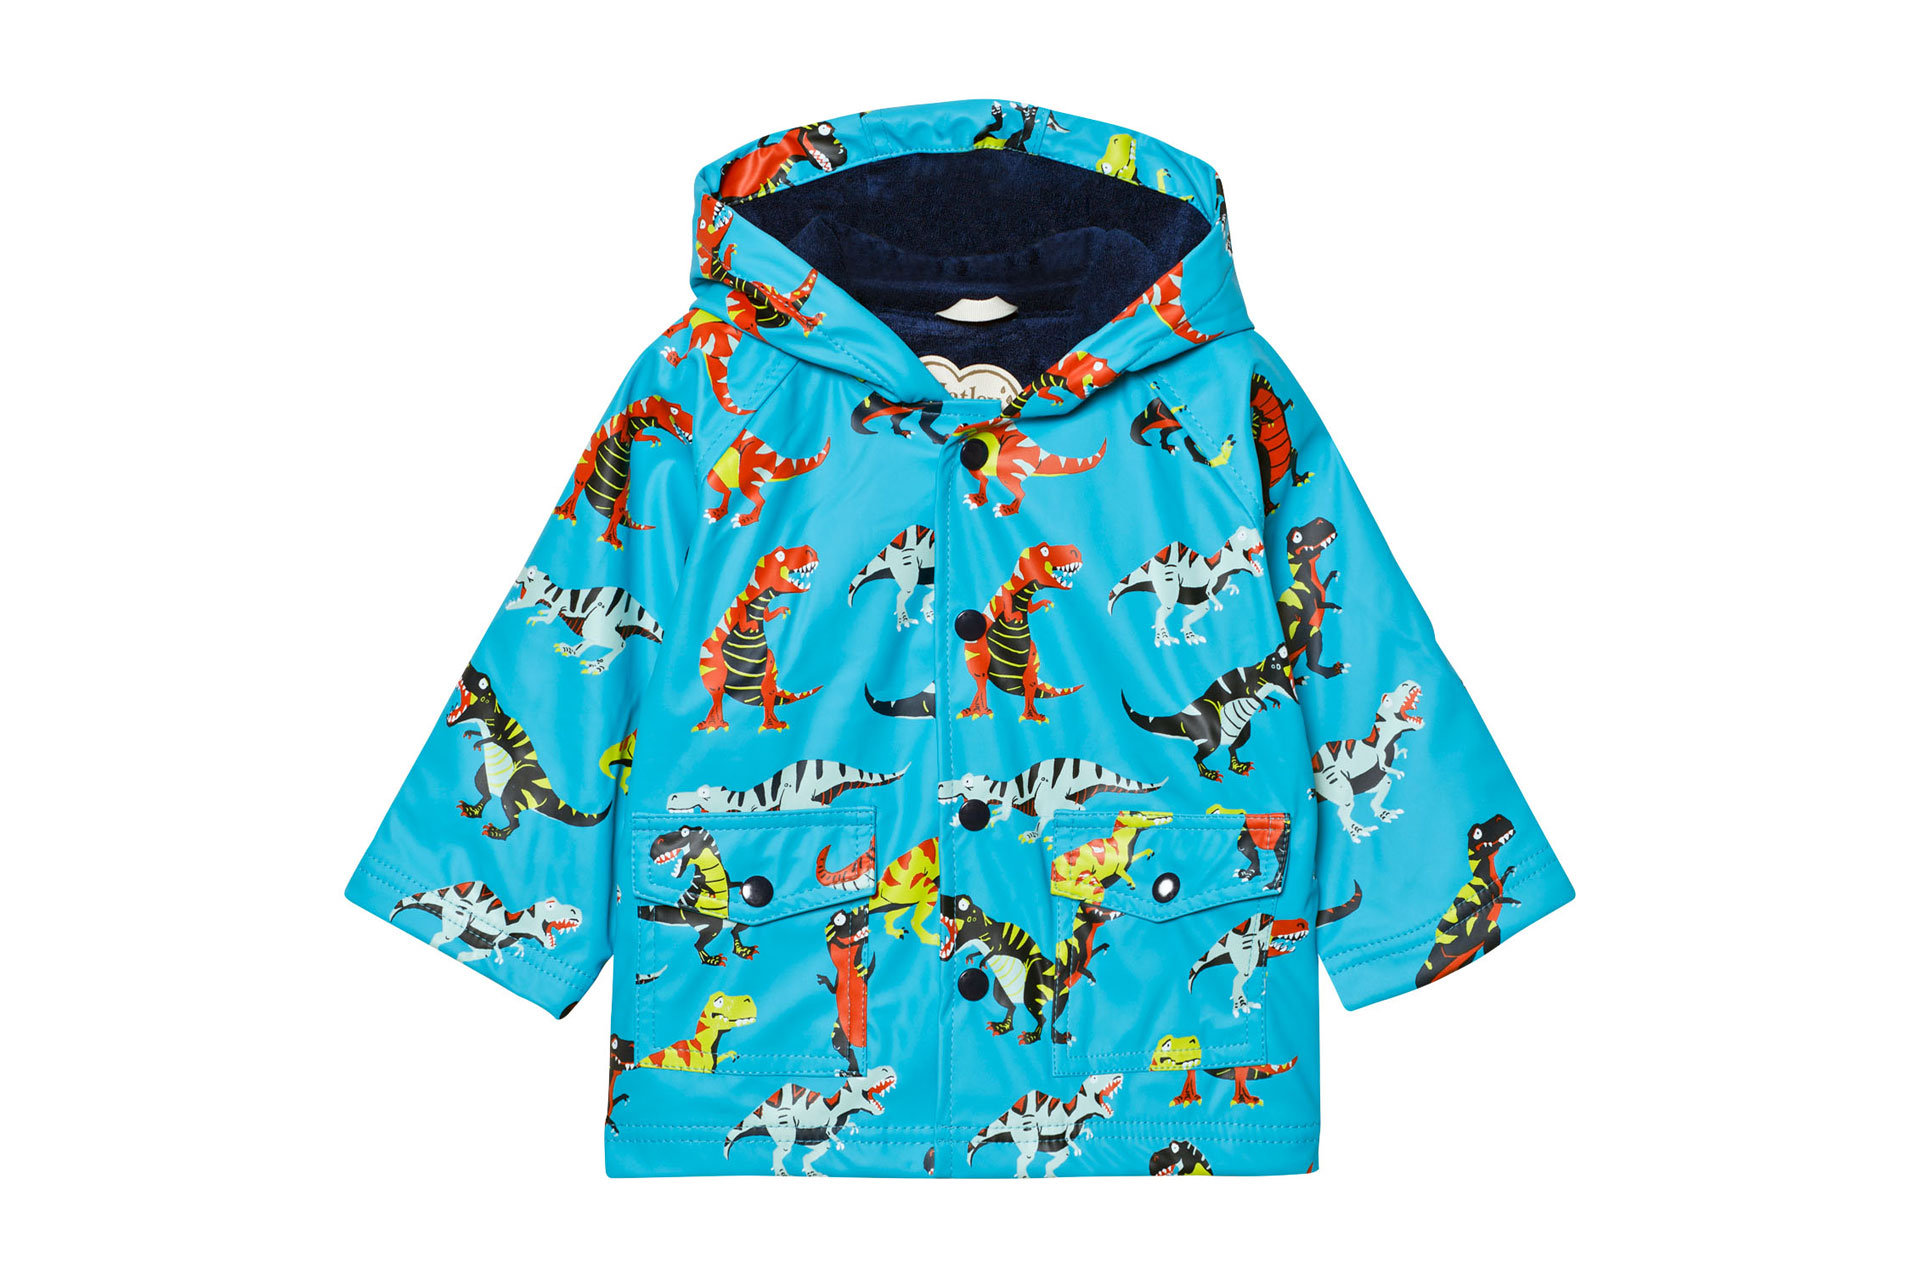 Hatley Blue Dinosaur Print Fleece Lined Raincoat